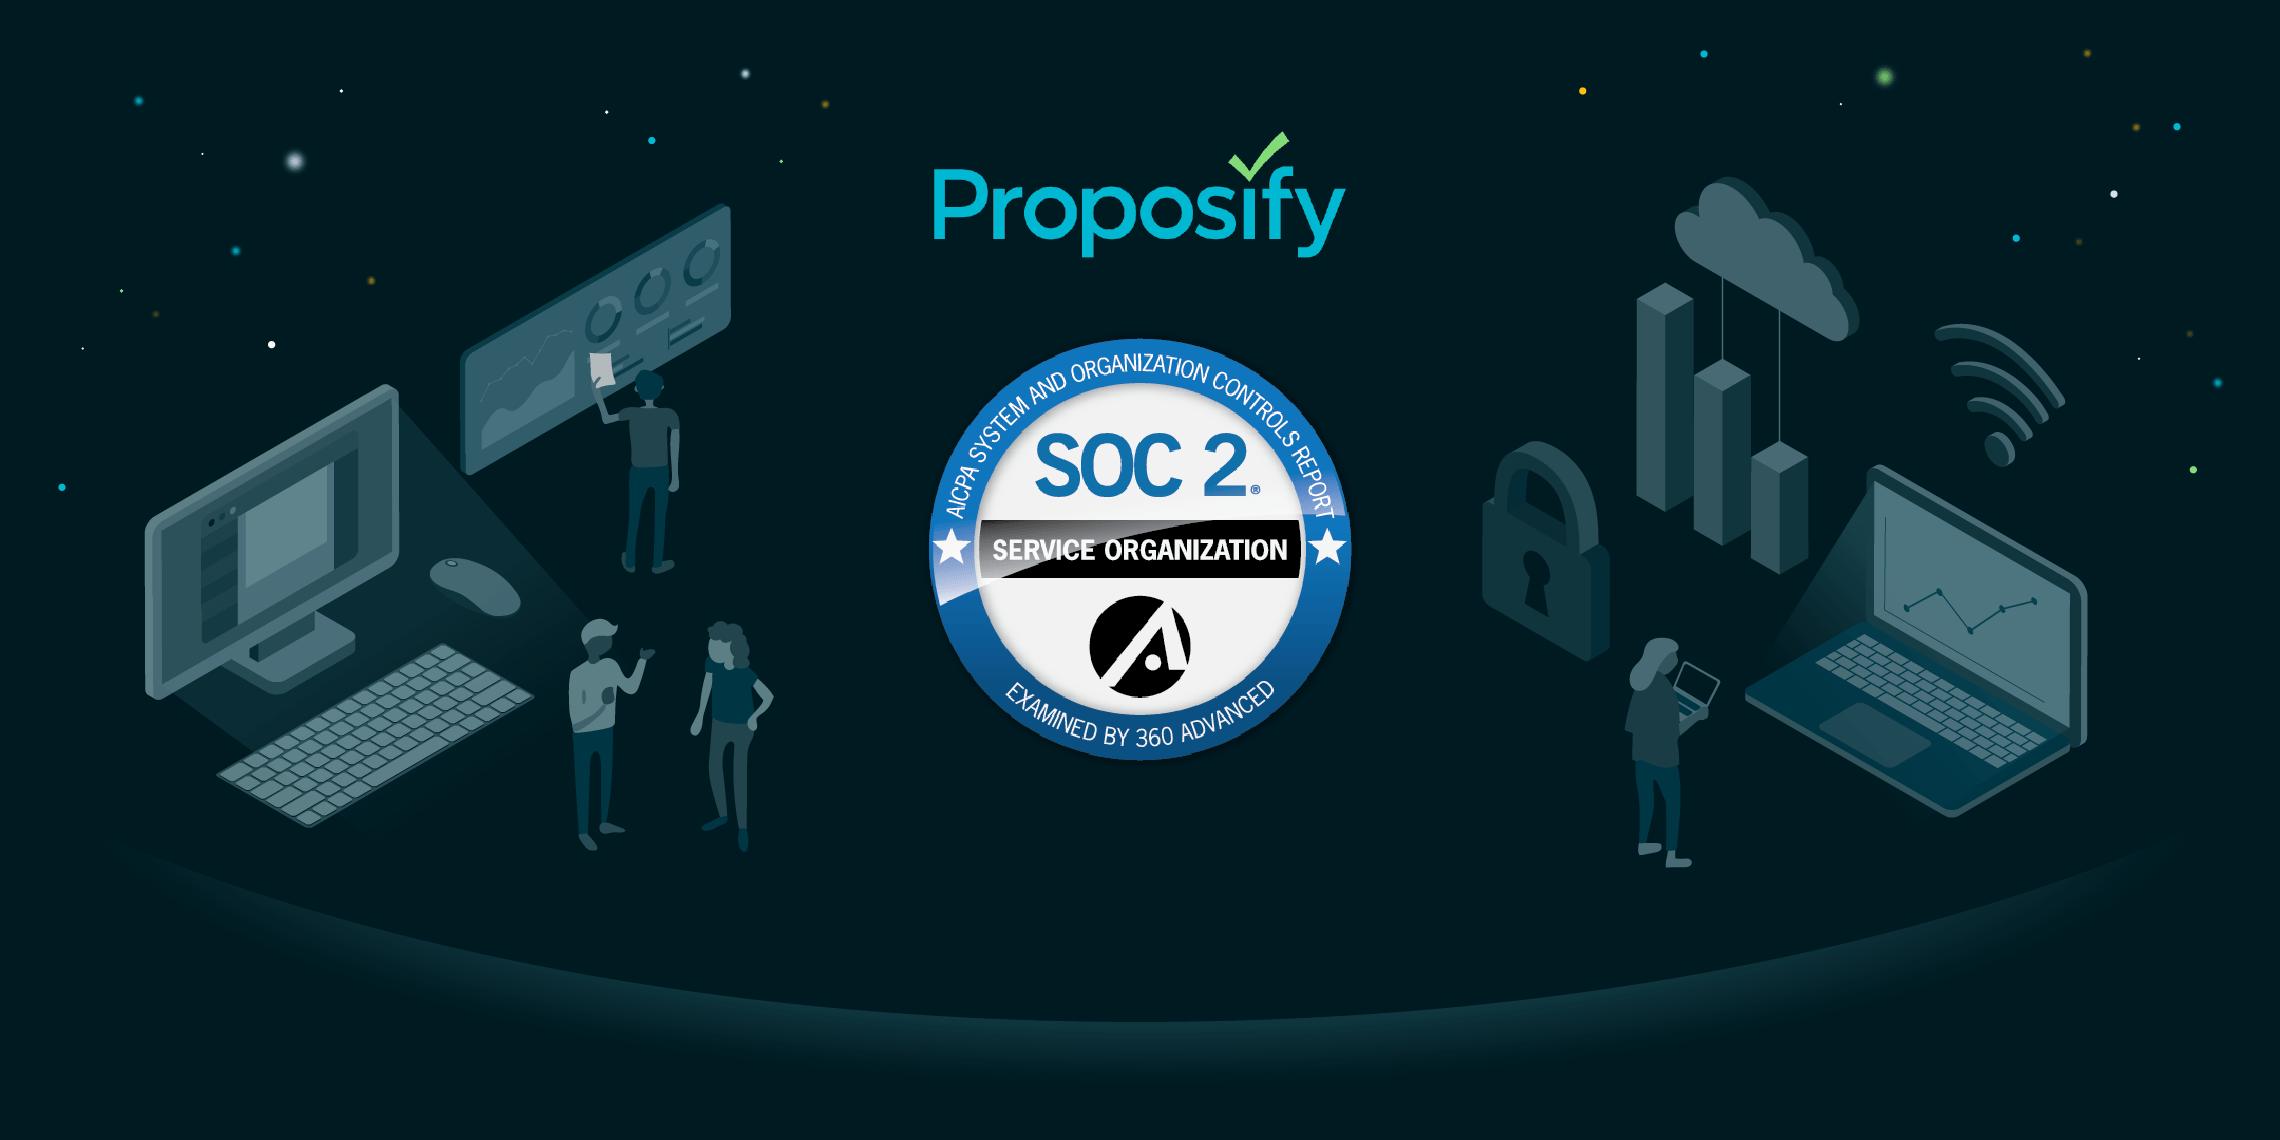 proposify's soc2 compliance announcement